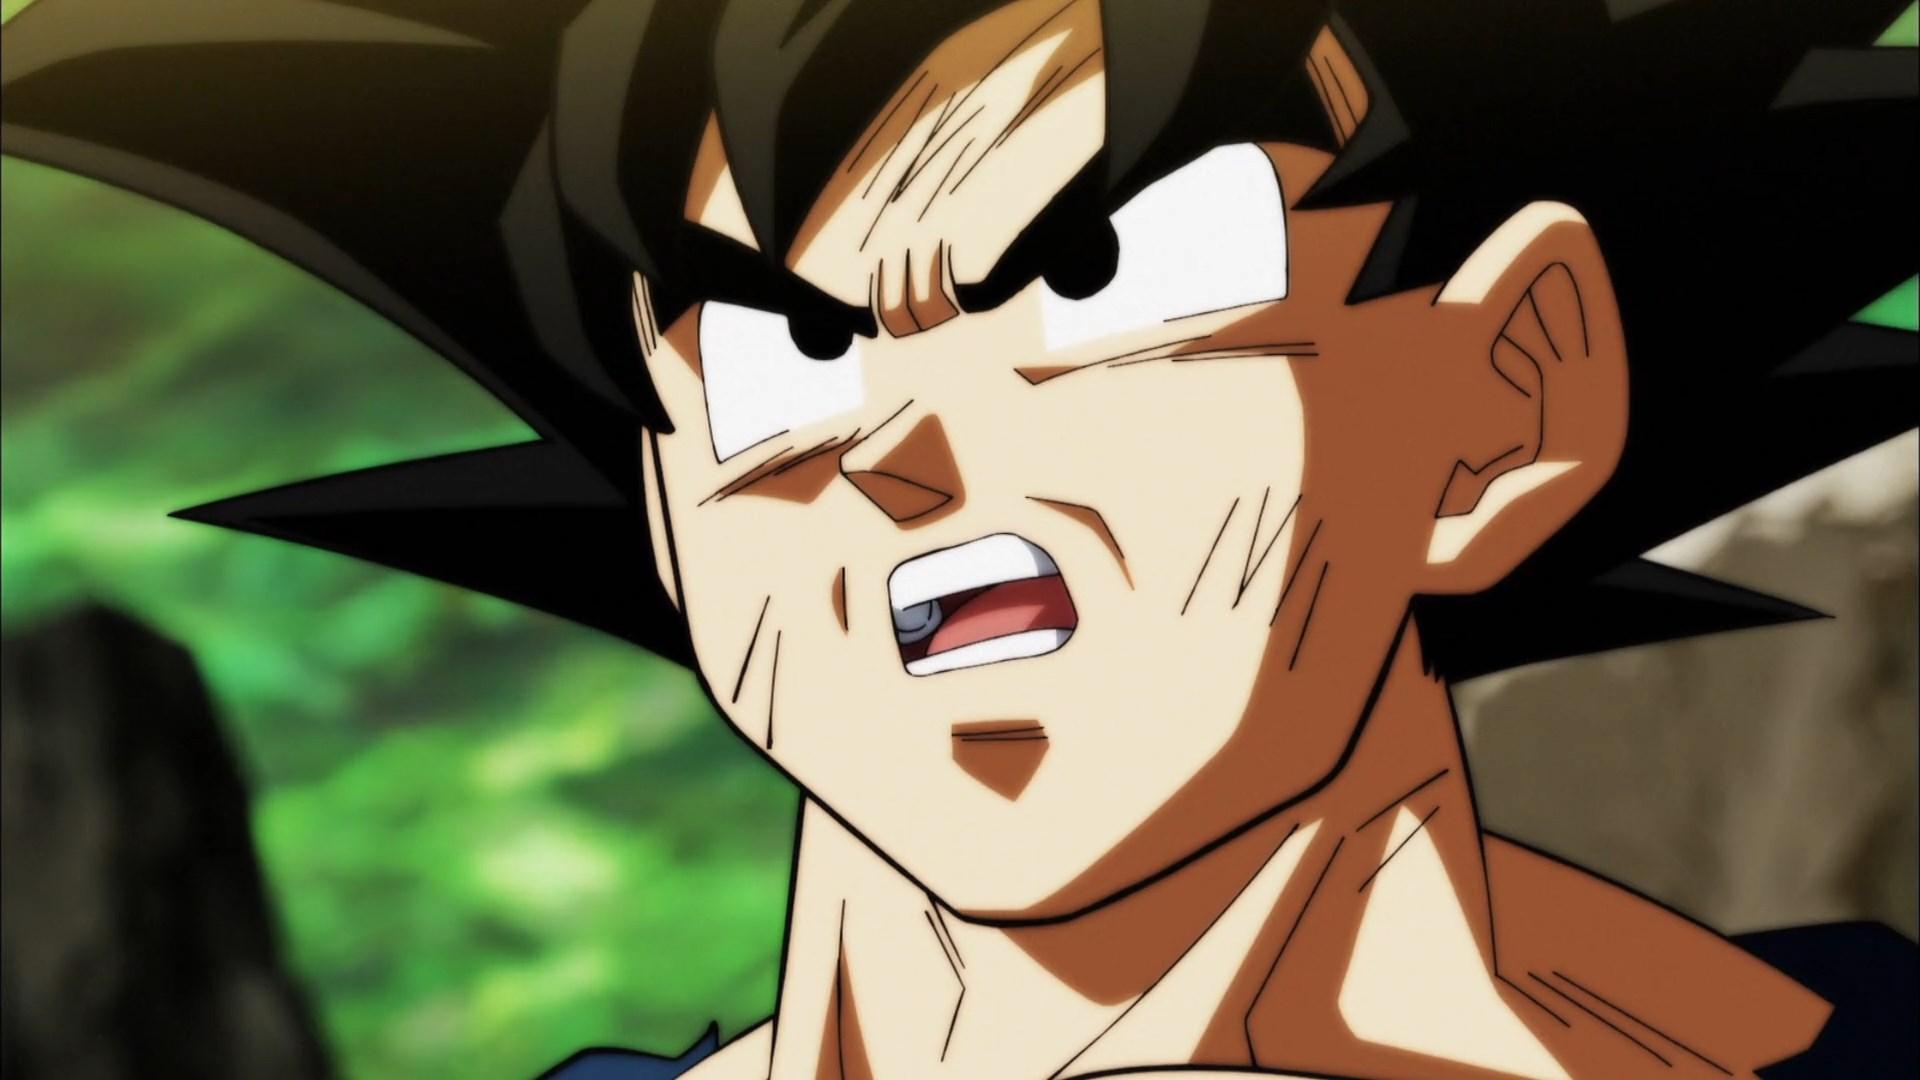 [HorribleSubs] Dragon Ball Super - 121 [1080p].mkv_snapshot_07.48